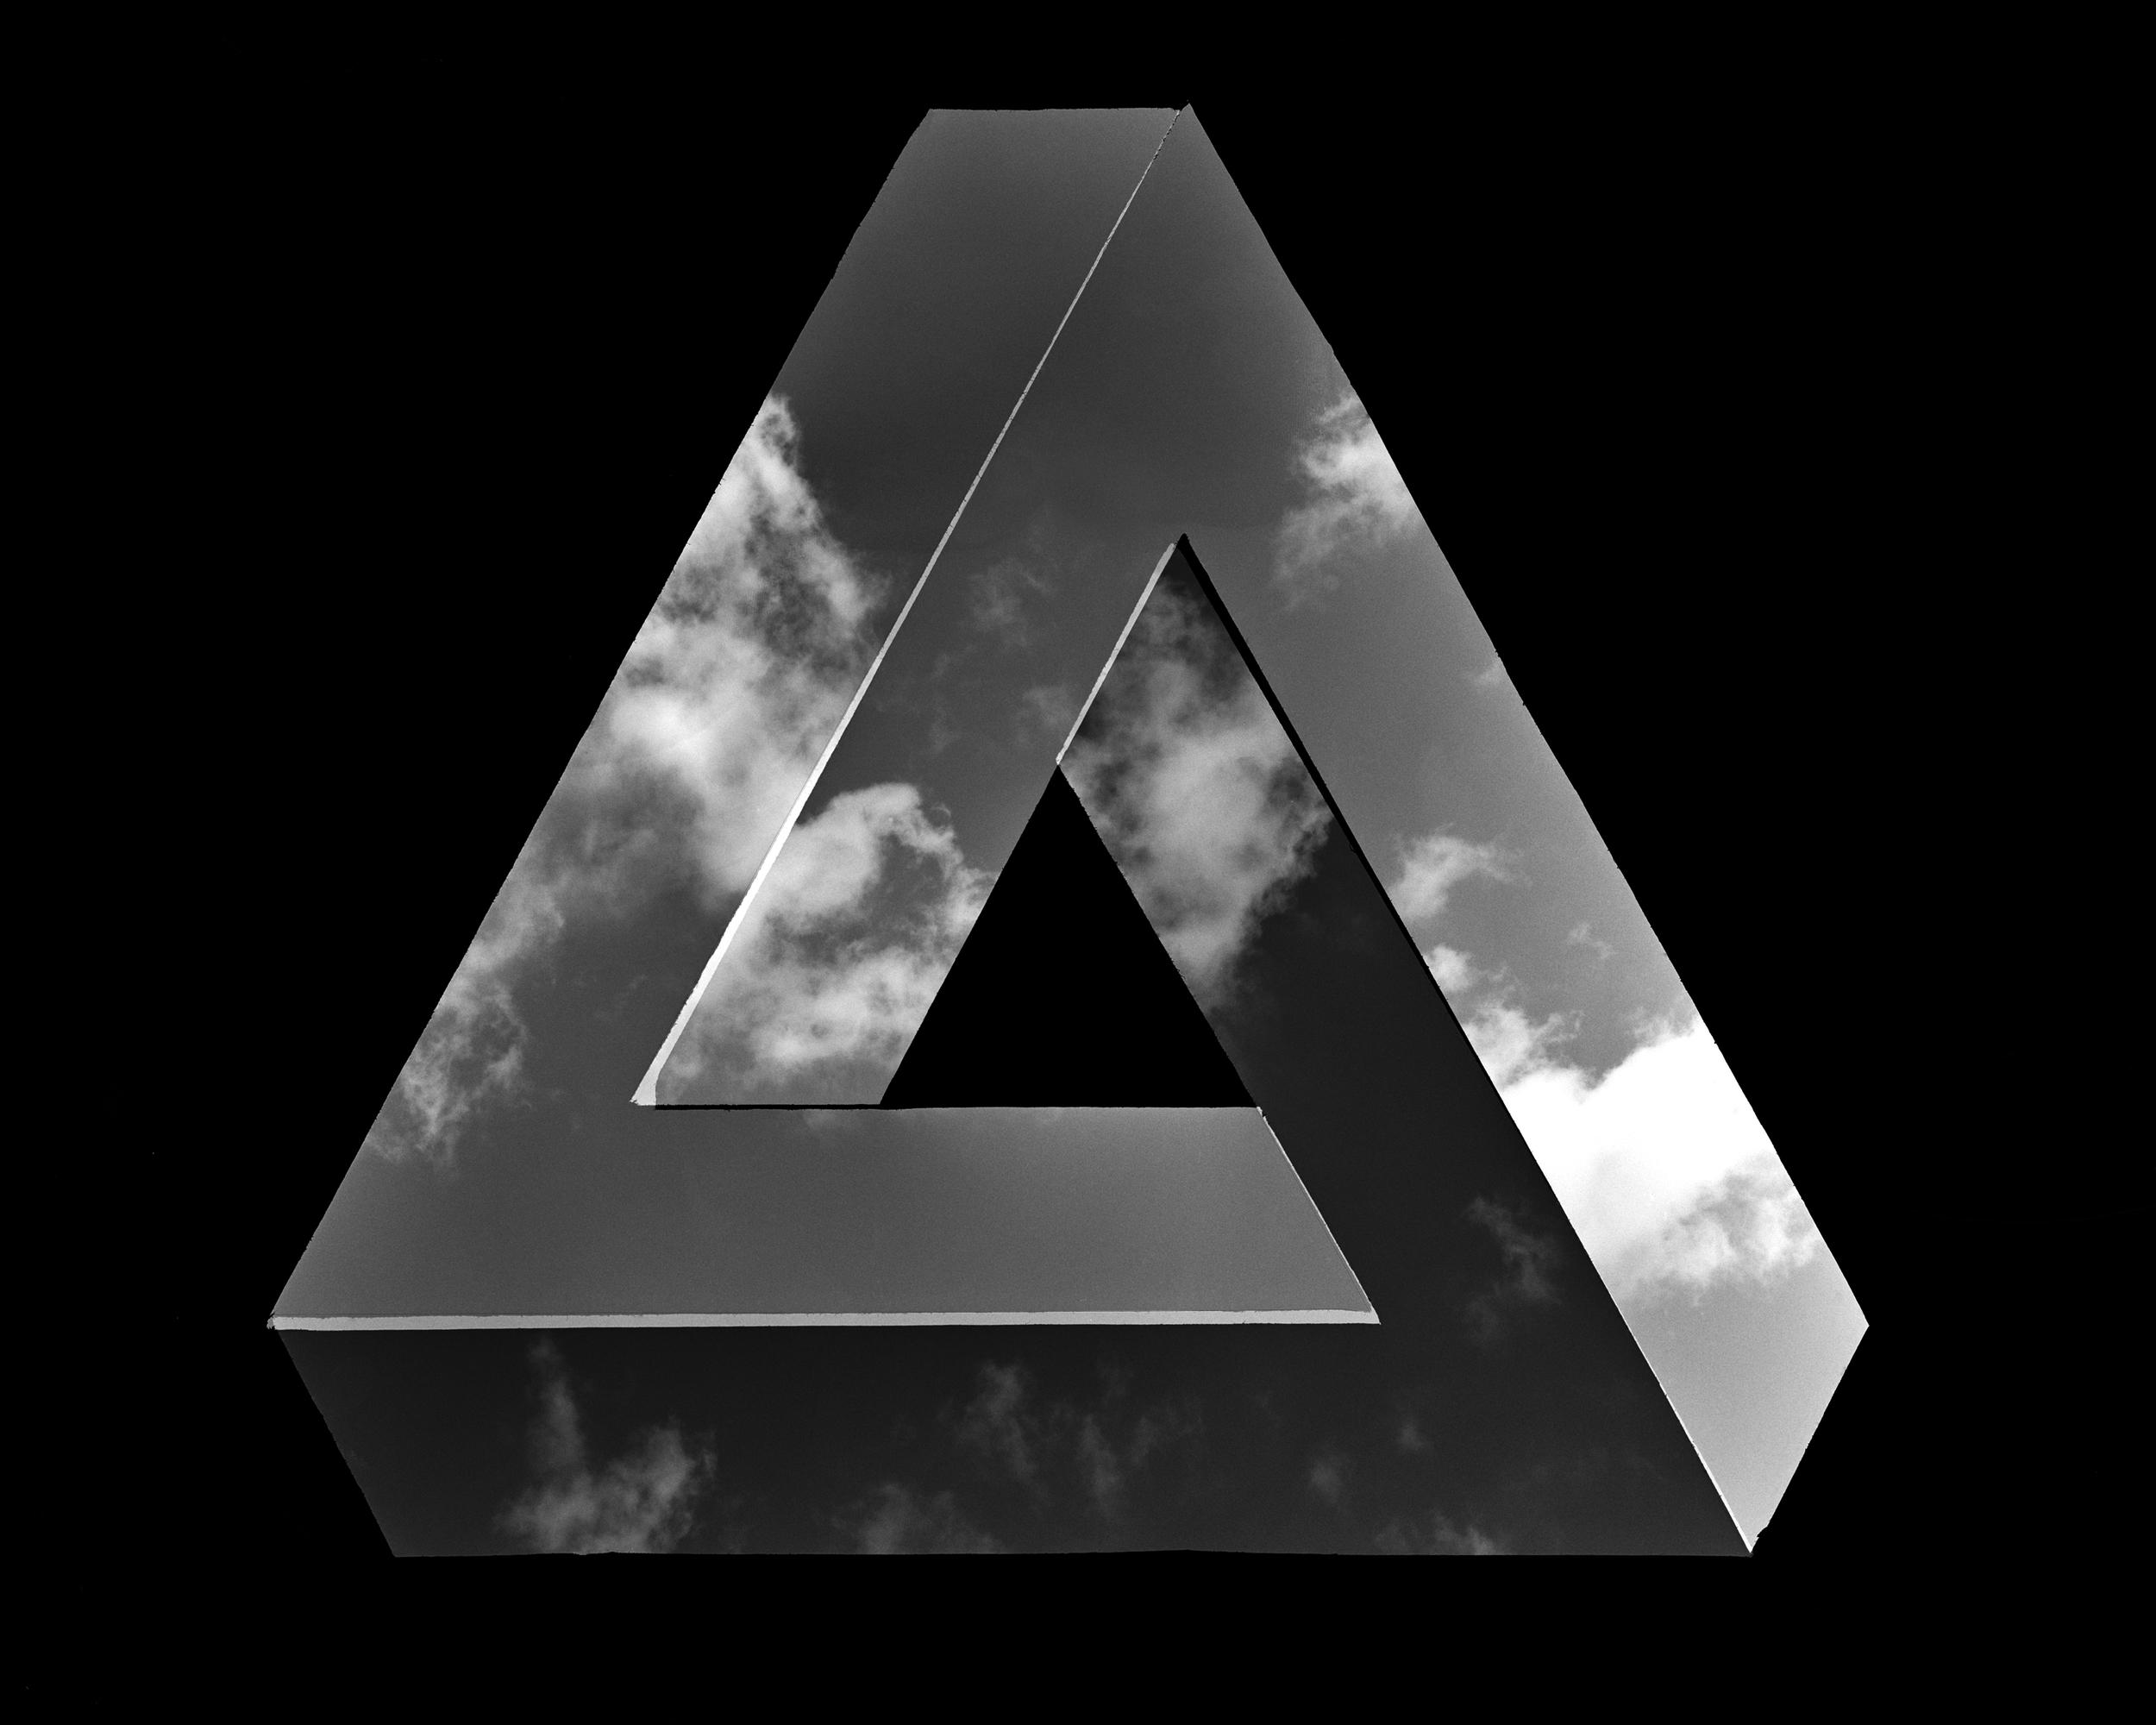 008 Penrose Triangle Clouds 3.jpg